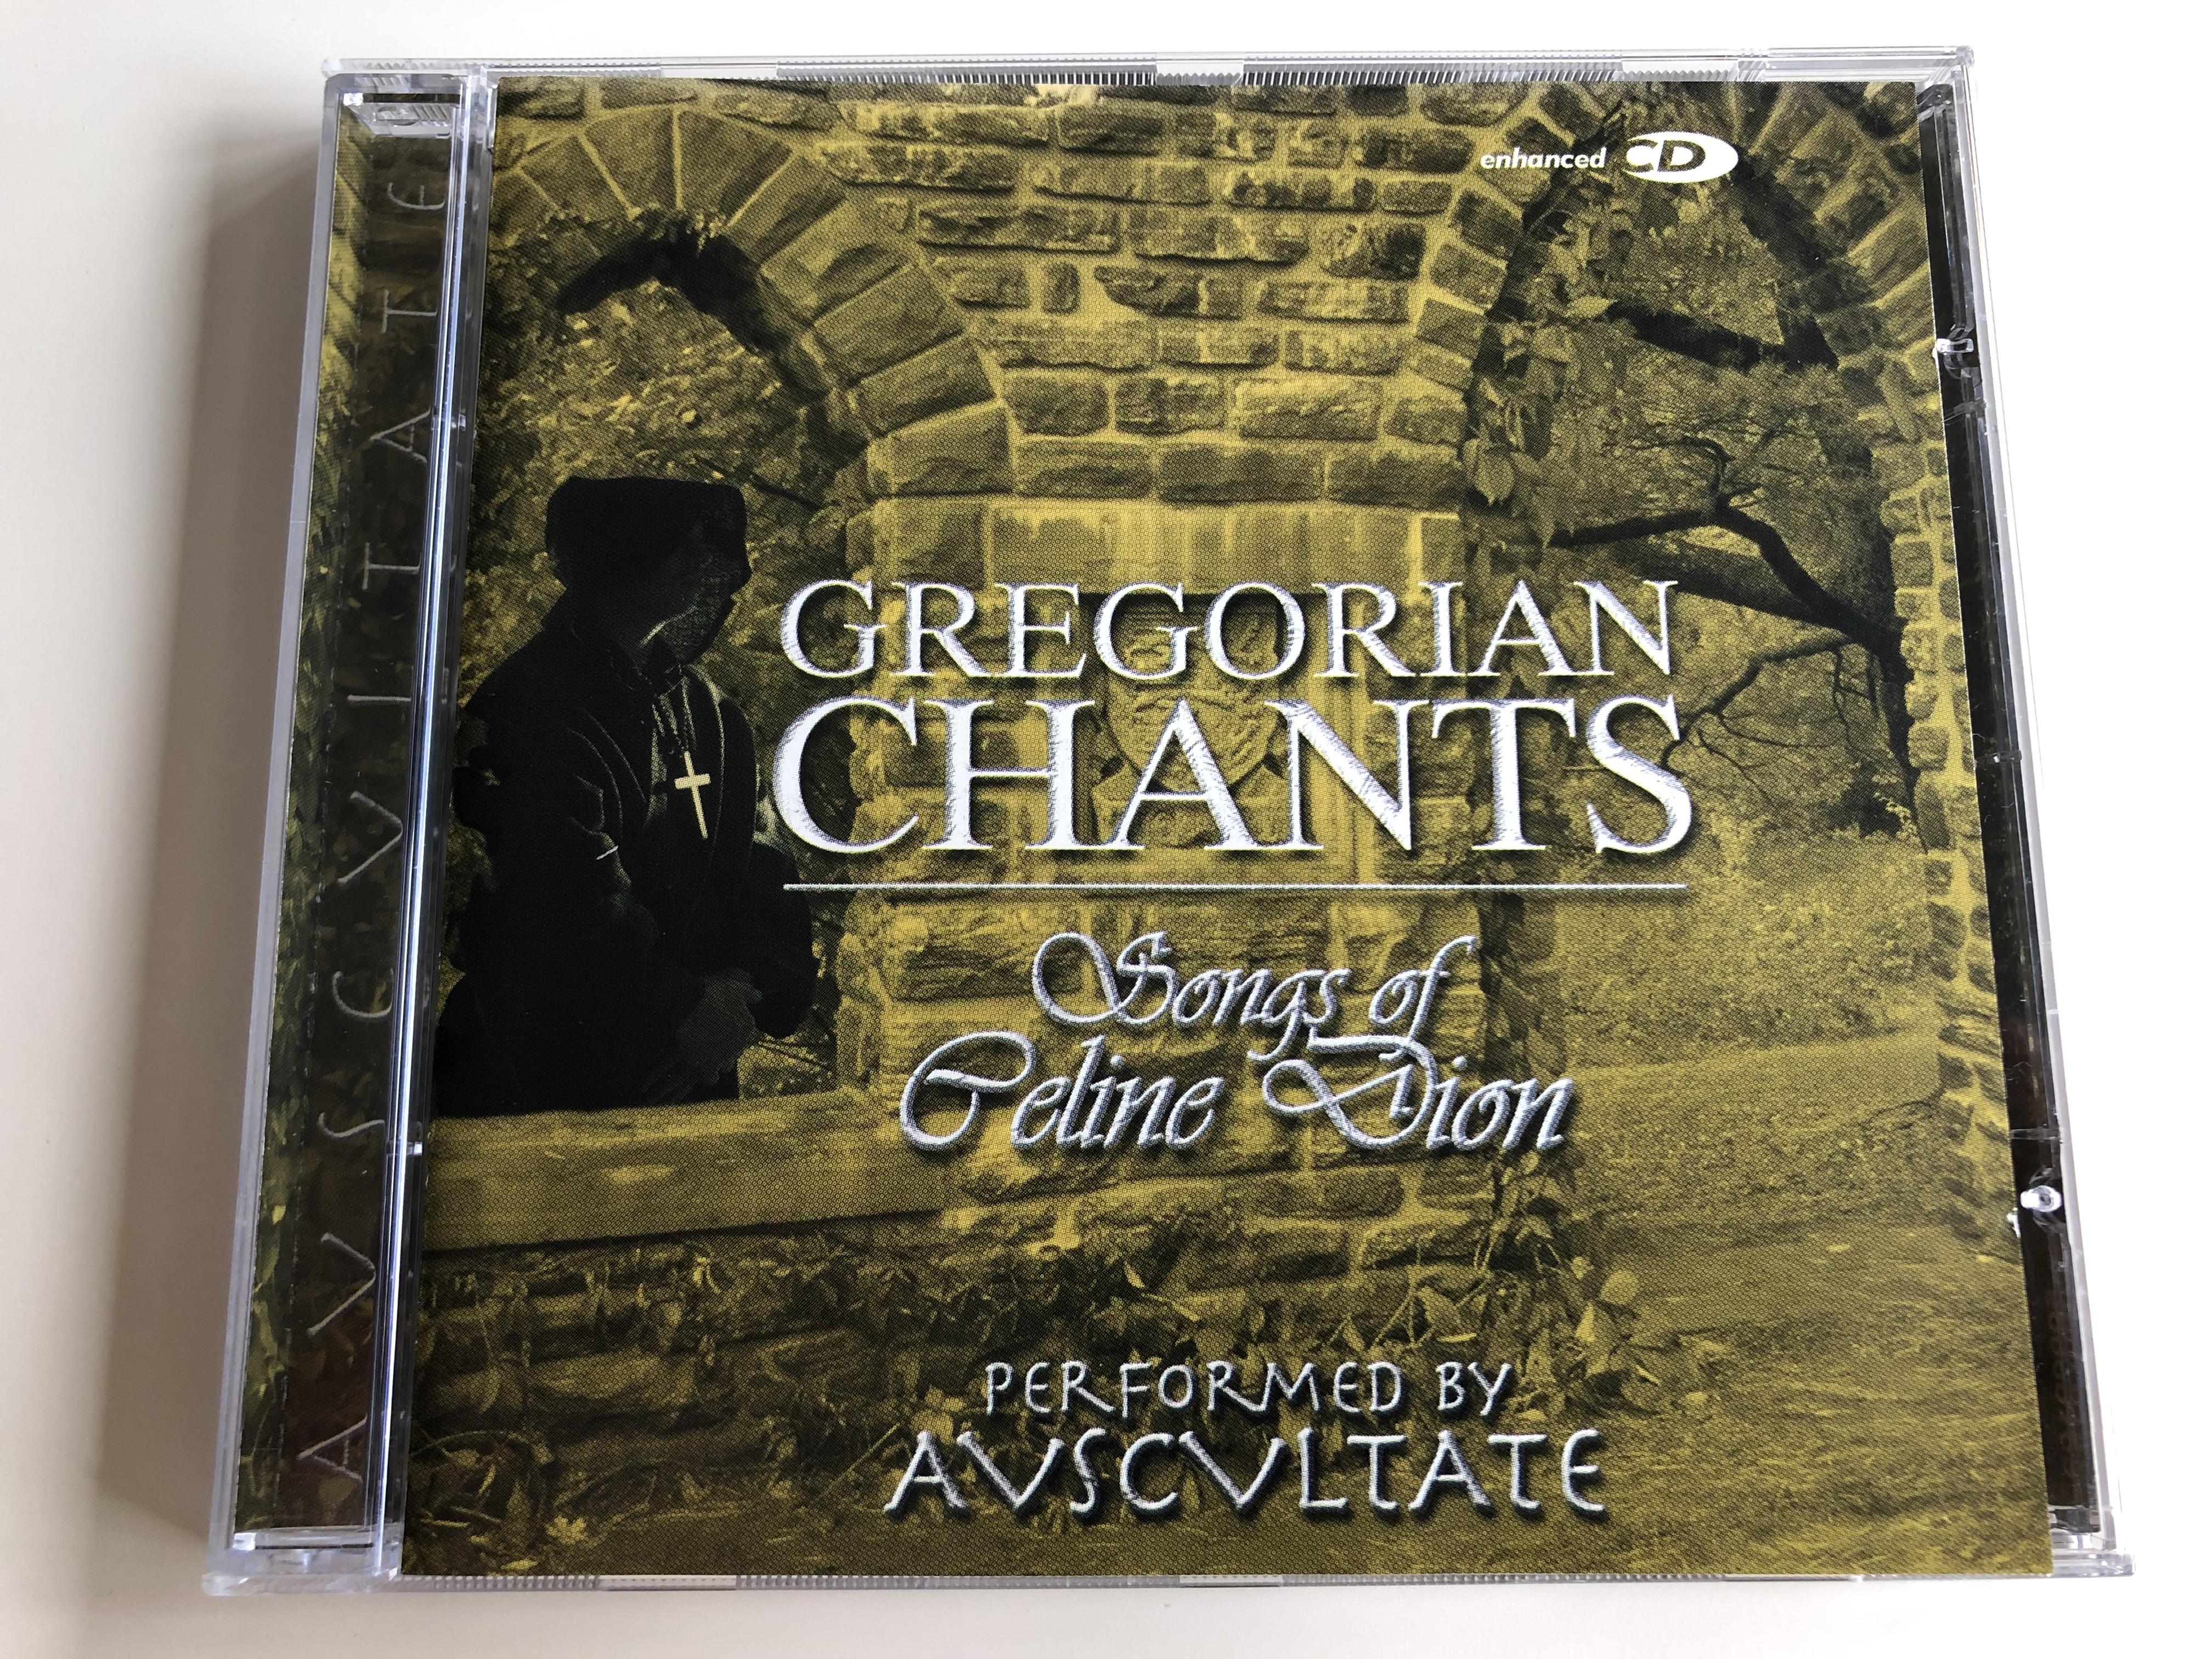 gregorian-chants-the-songs-of-celine-dion-performed-by-avscvltate-elap-music-audio-cd-2003-50020102-1-.jpg